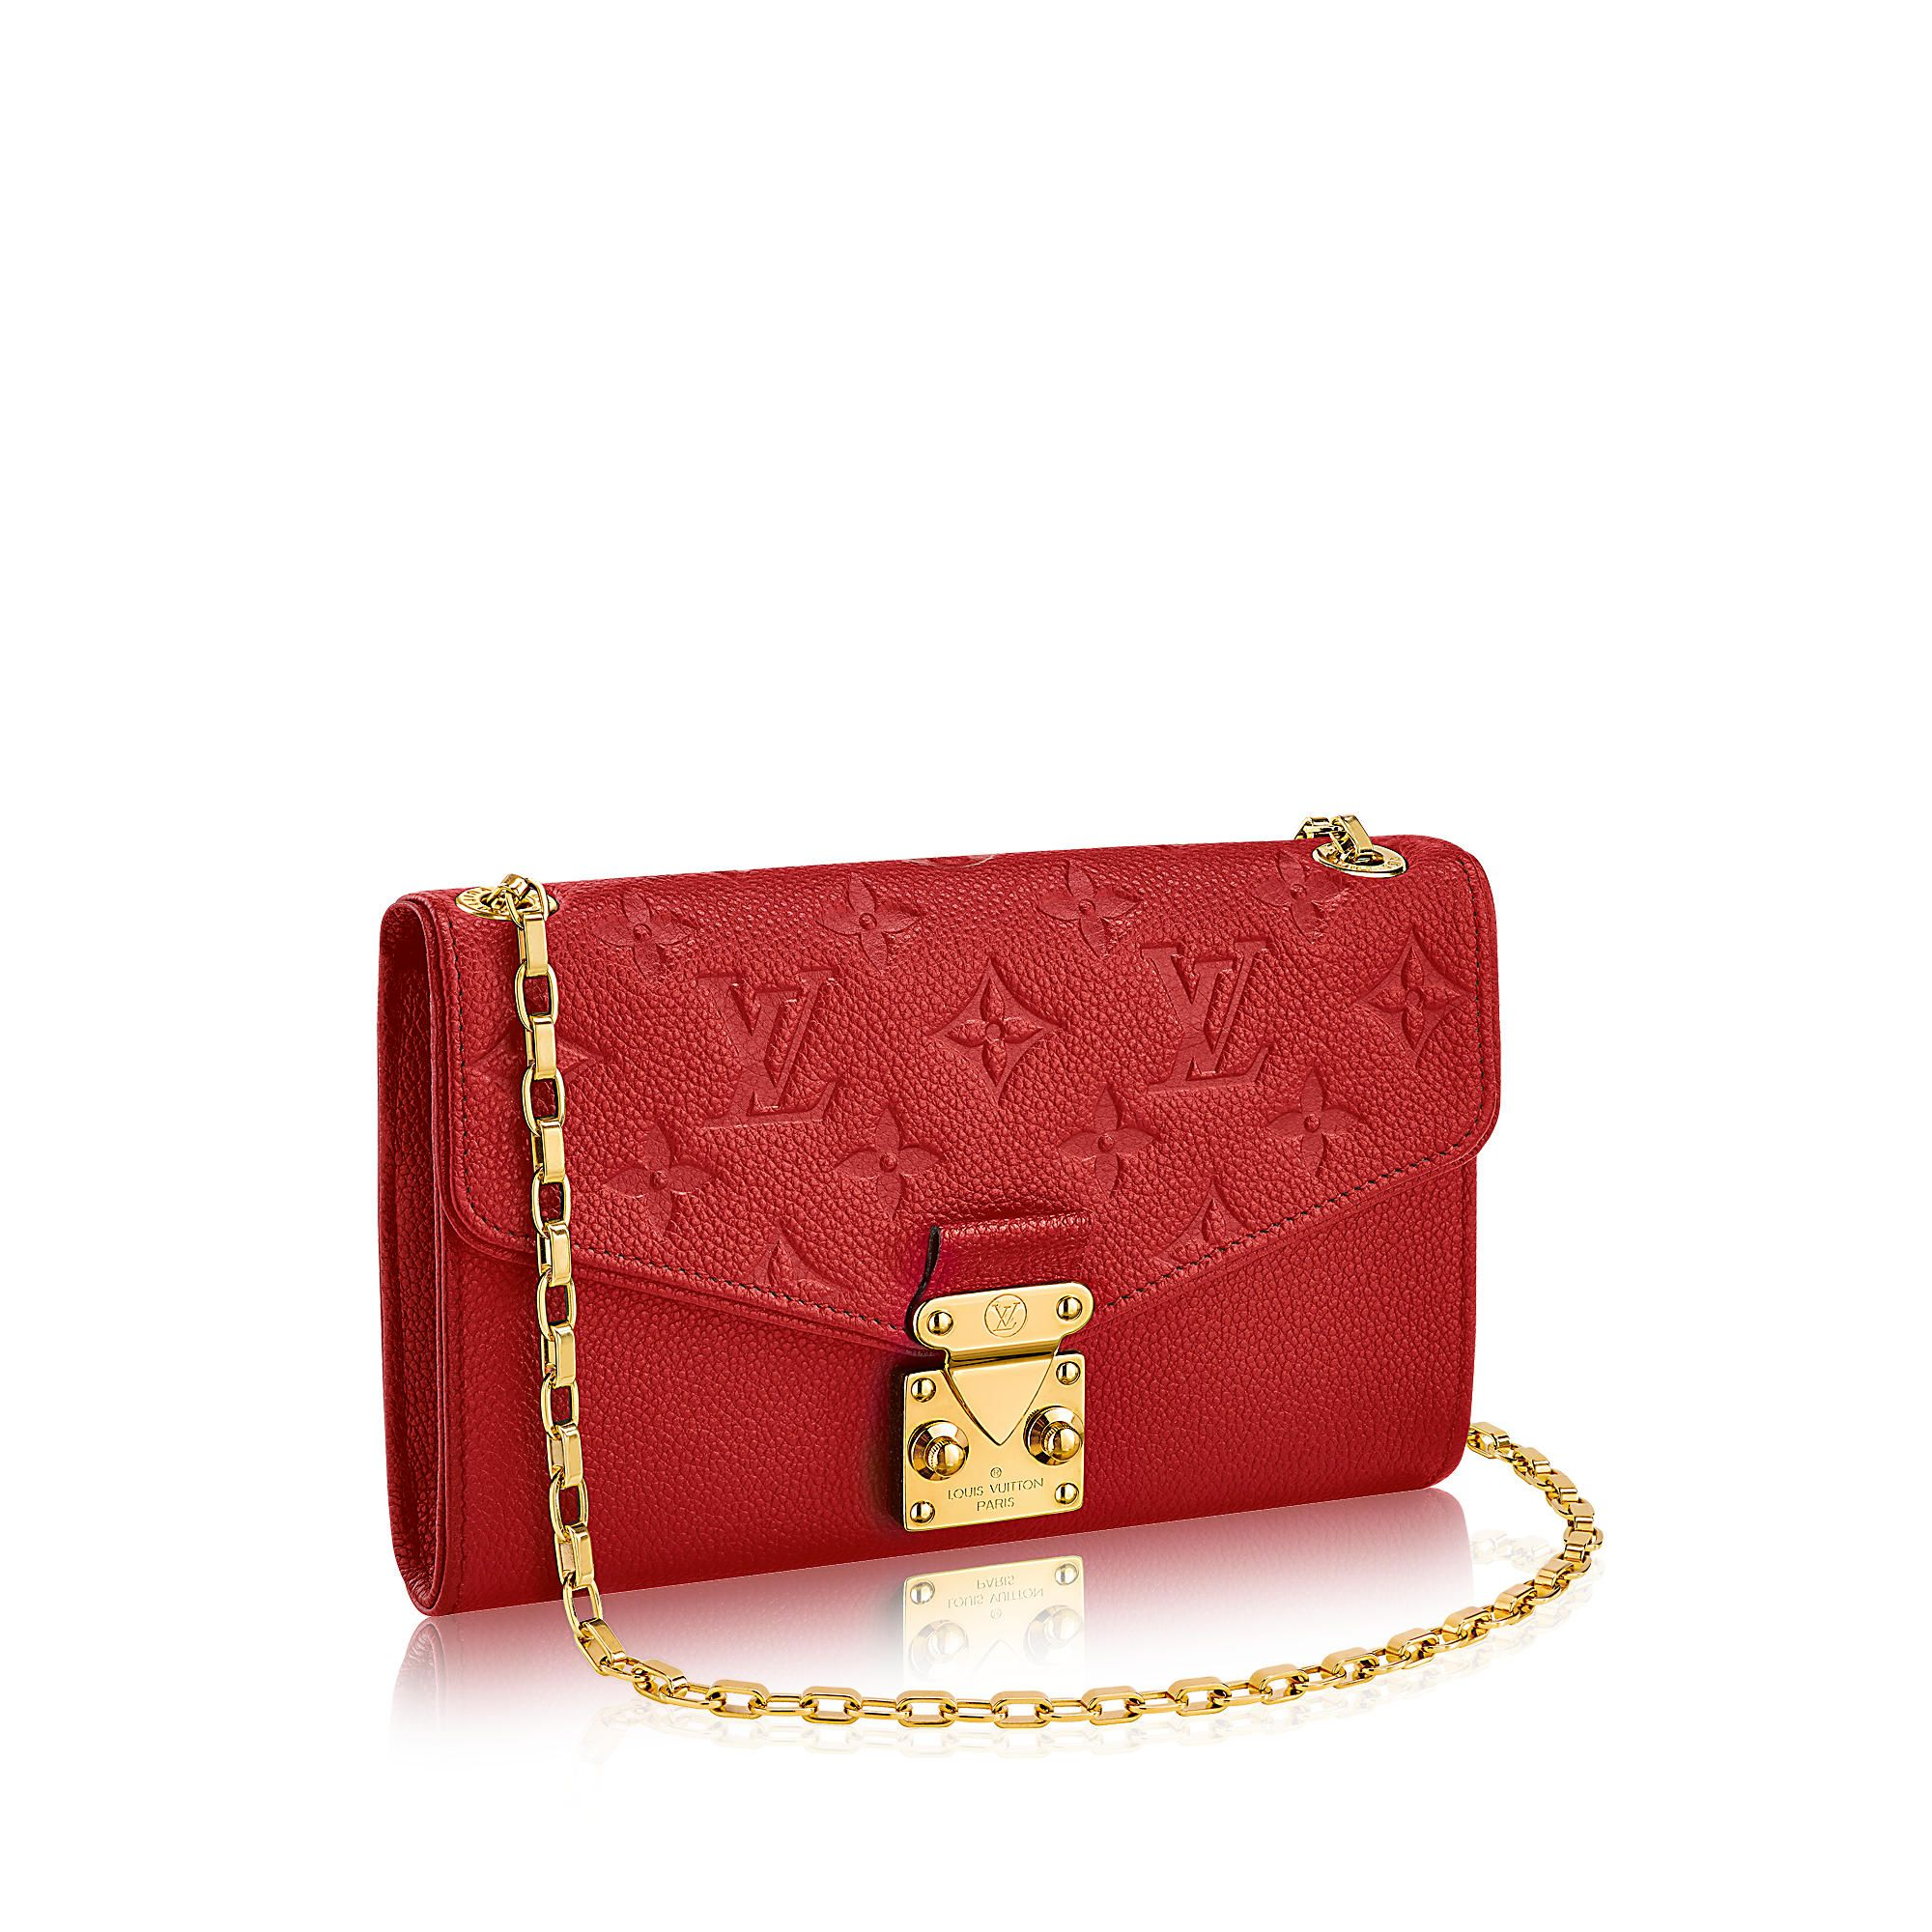 key:product_page_share_discover_product Pochette Saint-Germain via Louis  Vuitton